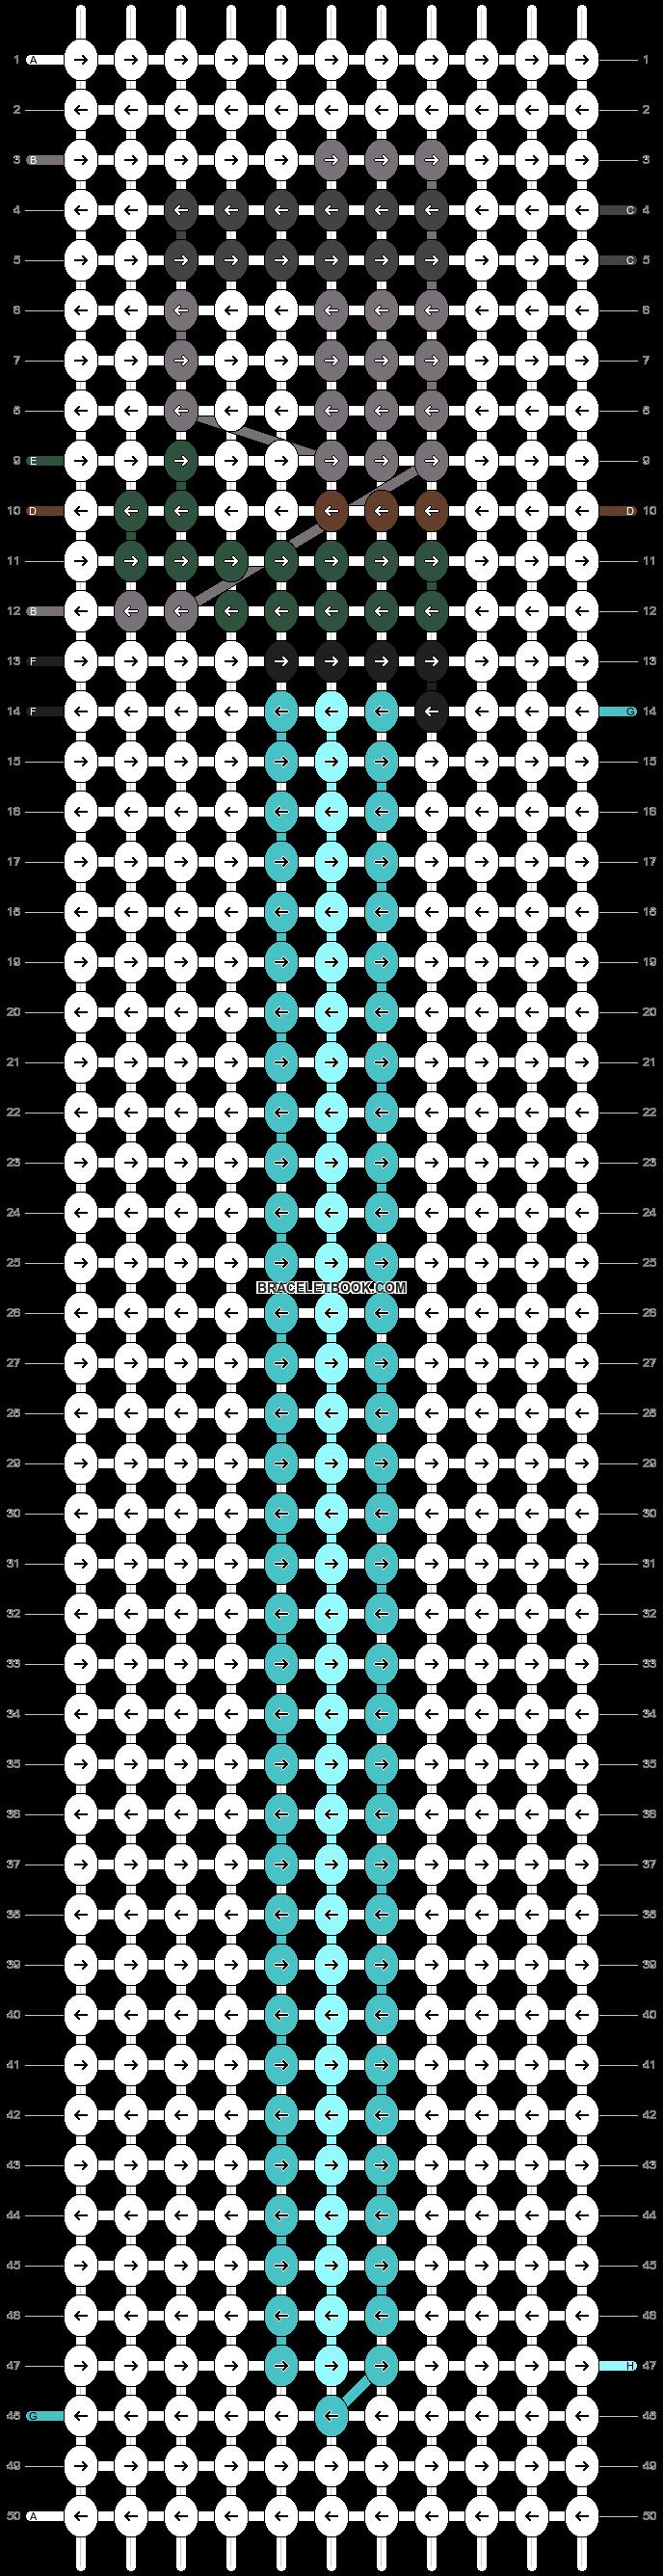 Alpha pattern #18146 pattern